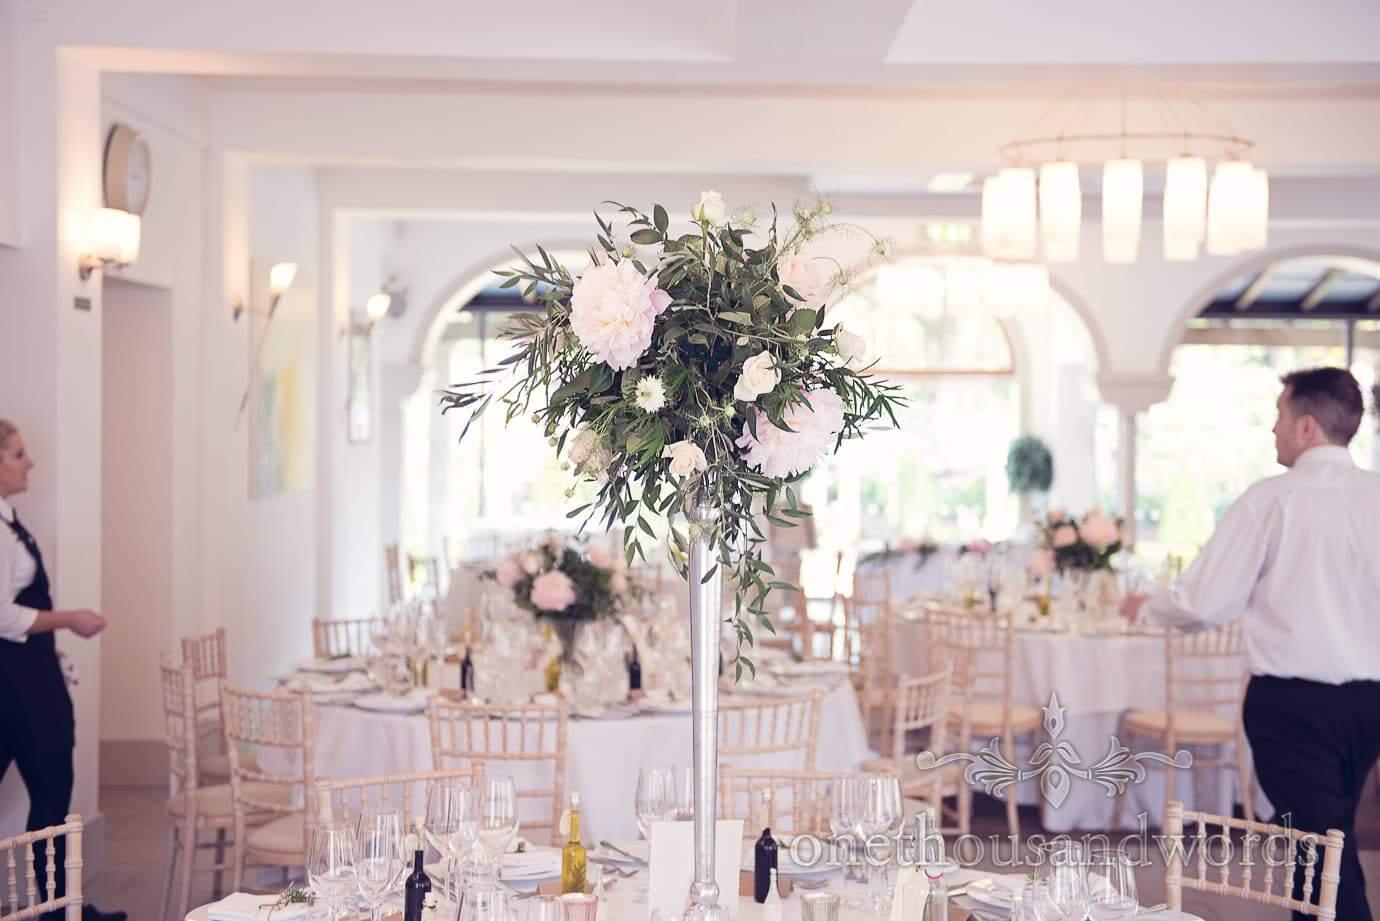 Floral table centerpiece at Italian Villa Wedding Photographs